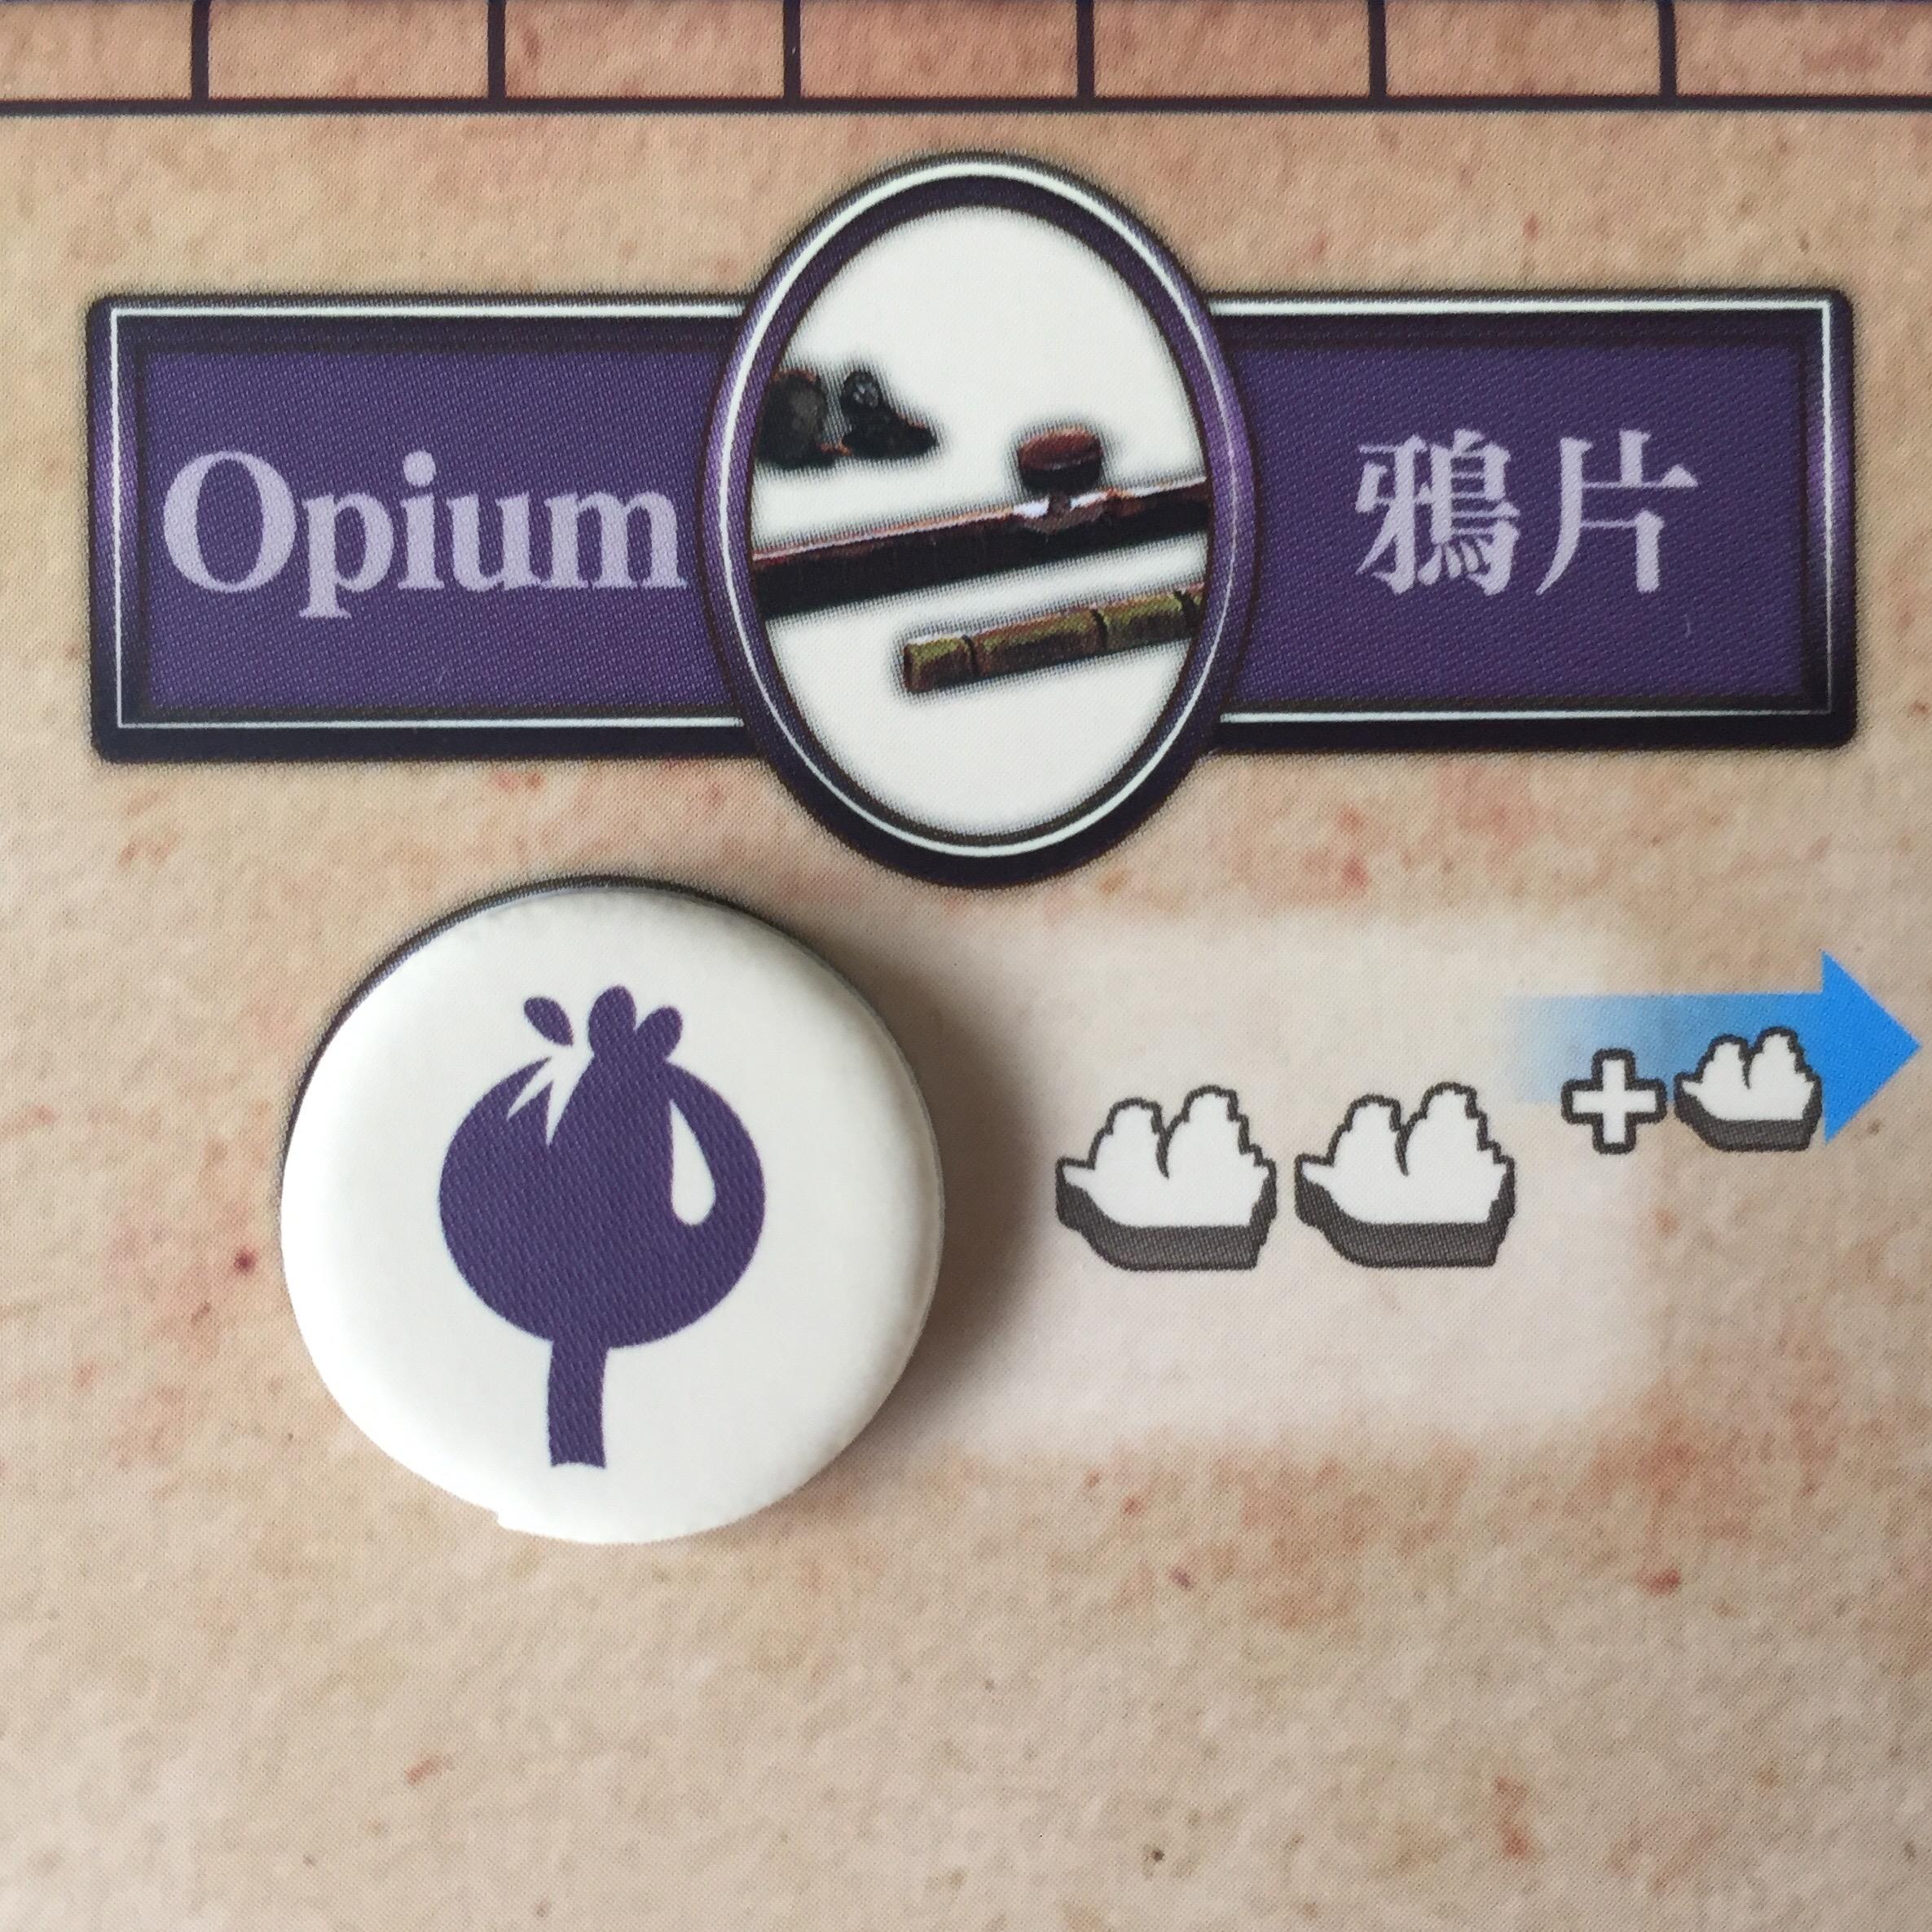 40 opium problem.jpg